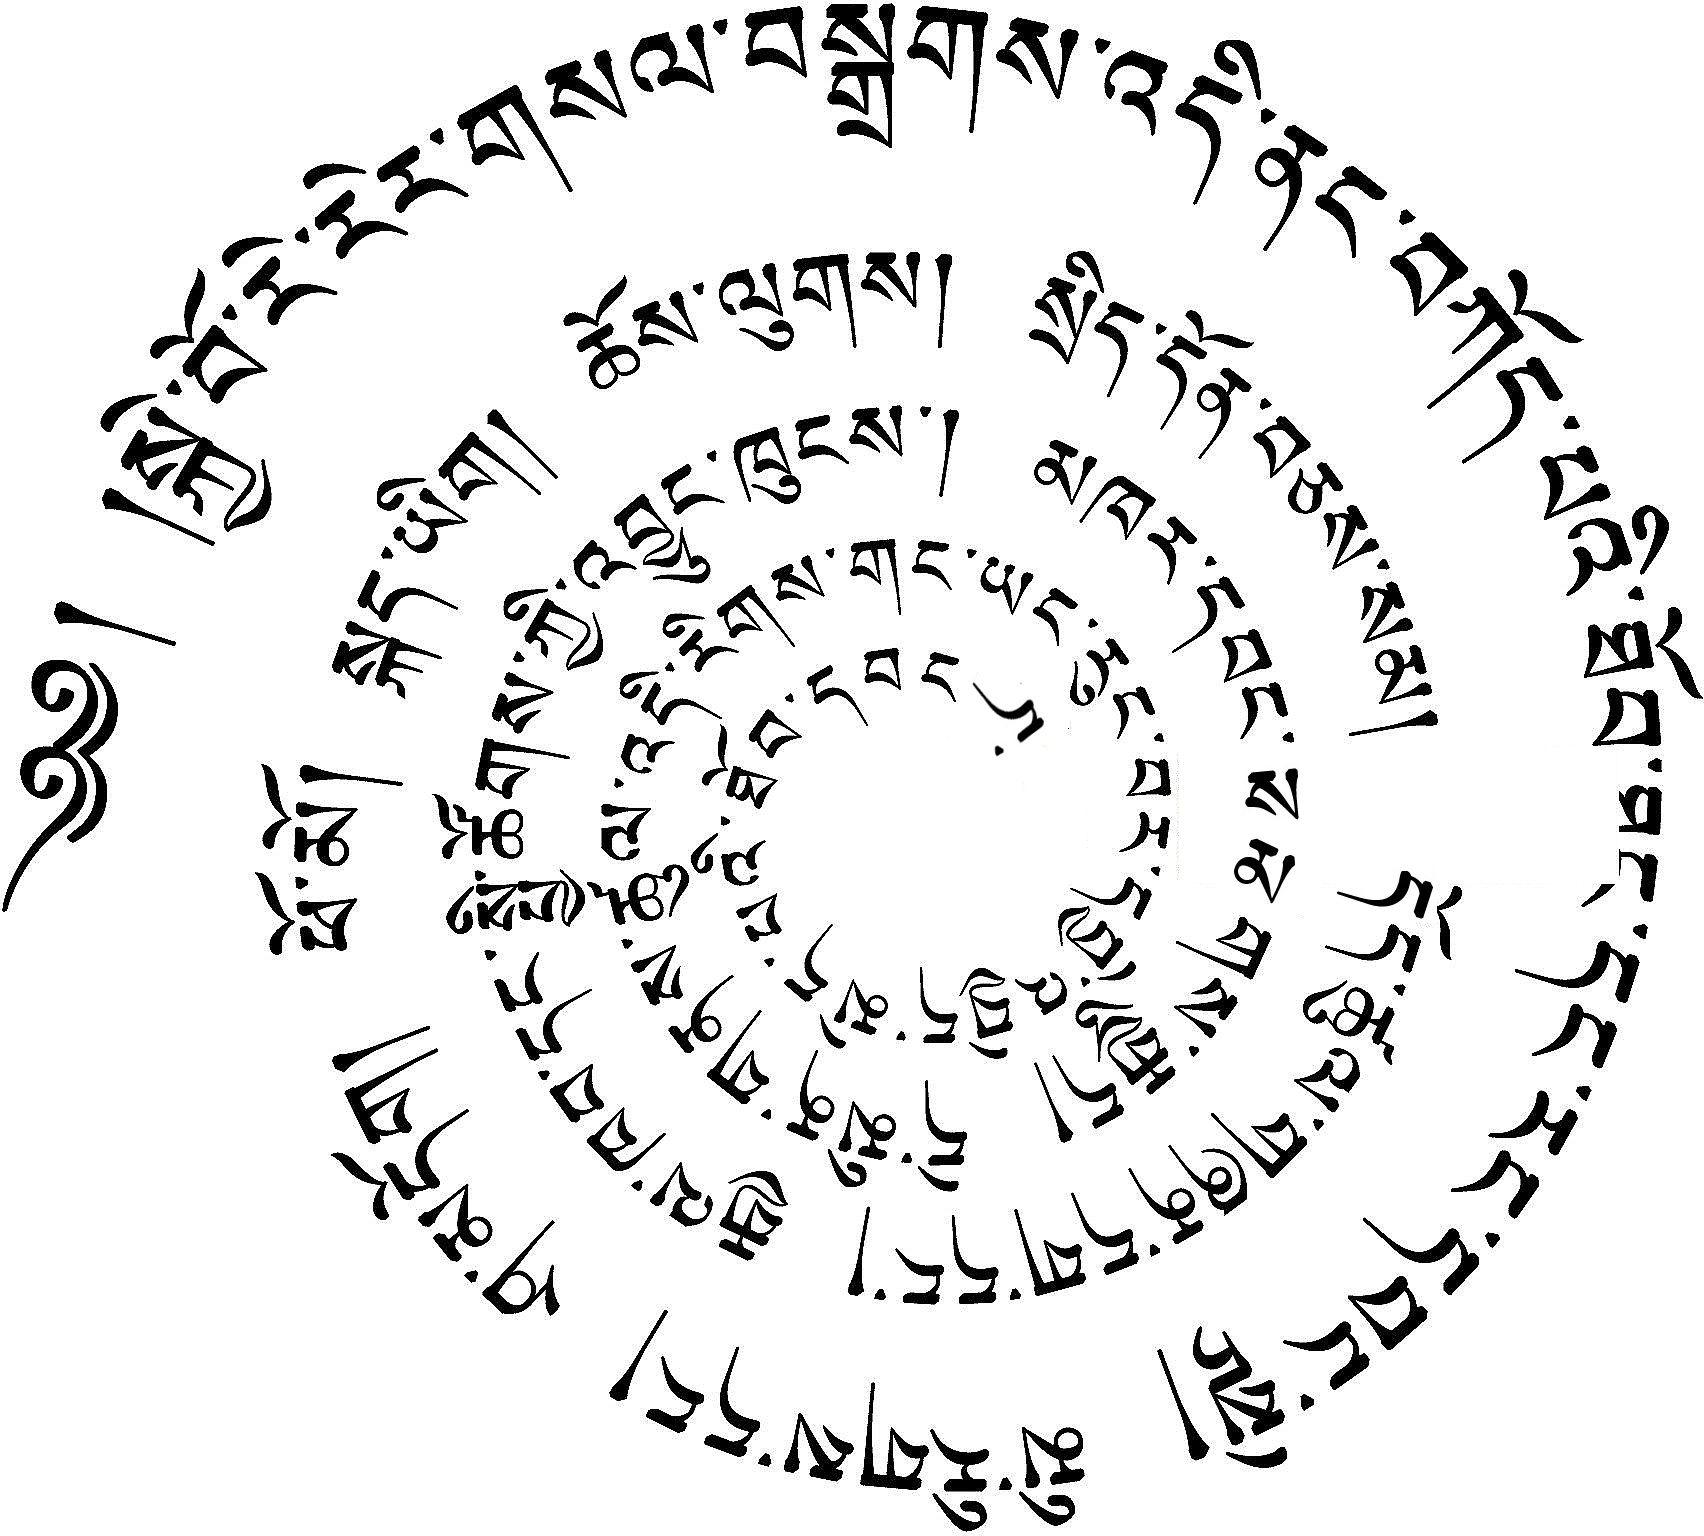 Tibetan Beautiful Writing Or The Most Beautiful Writing